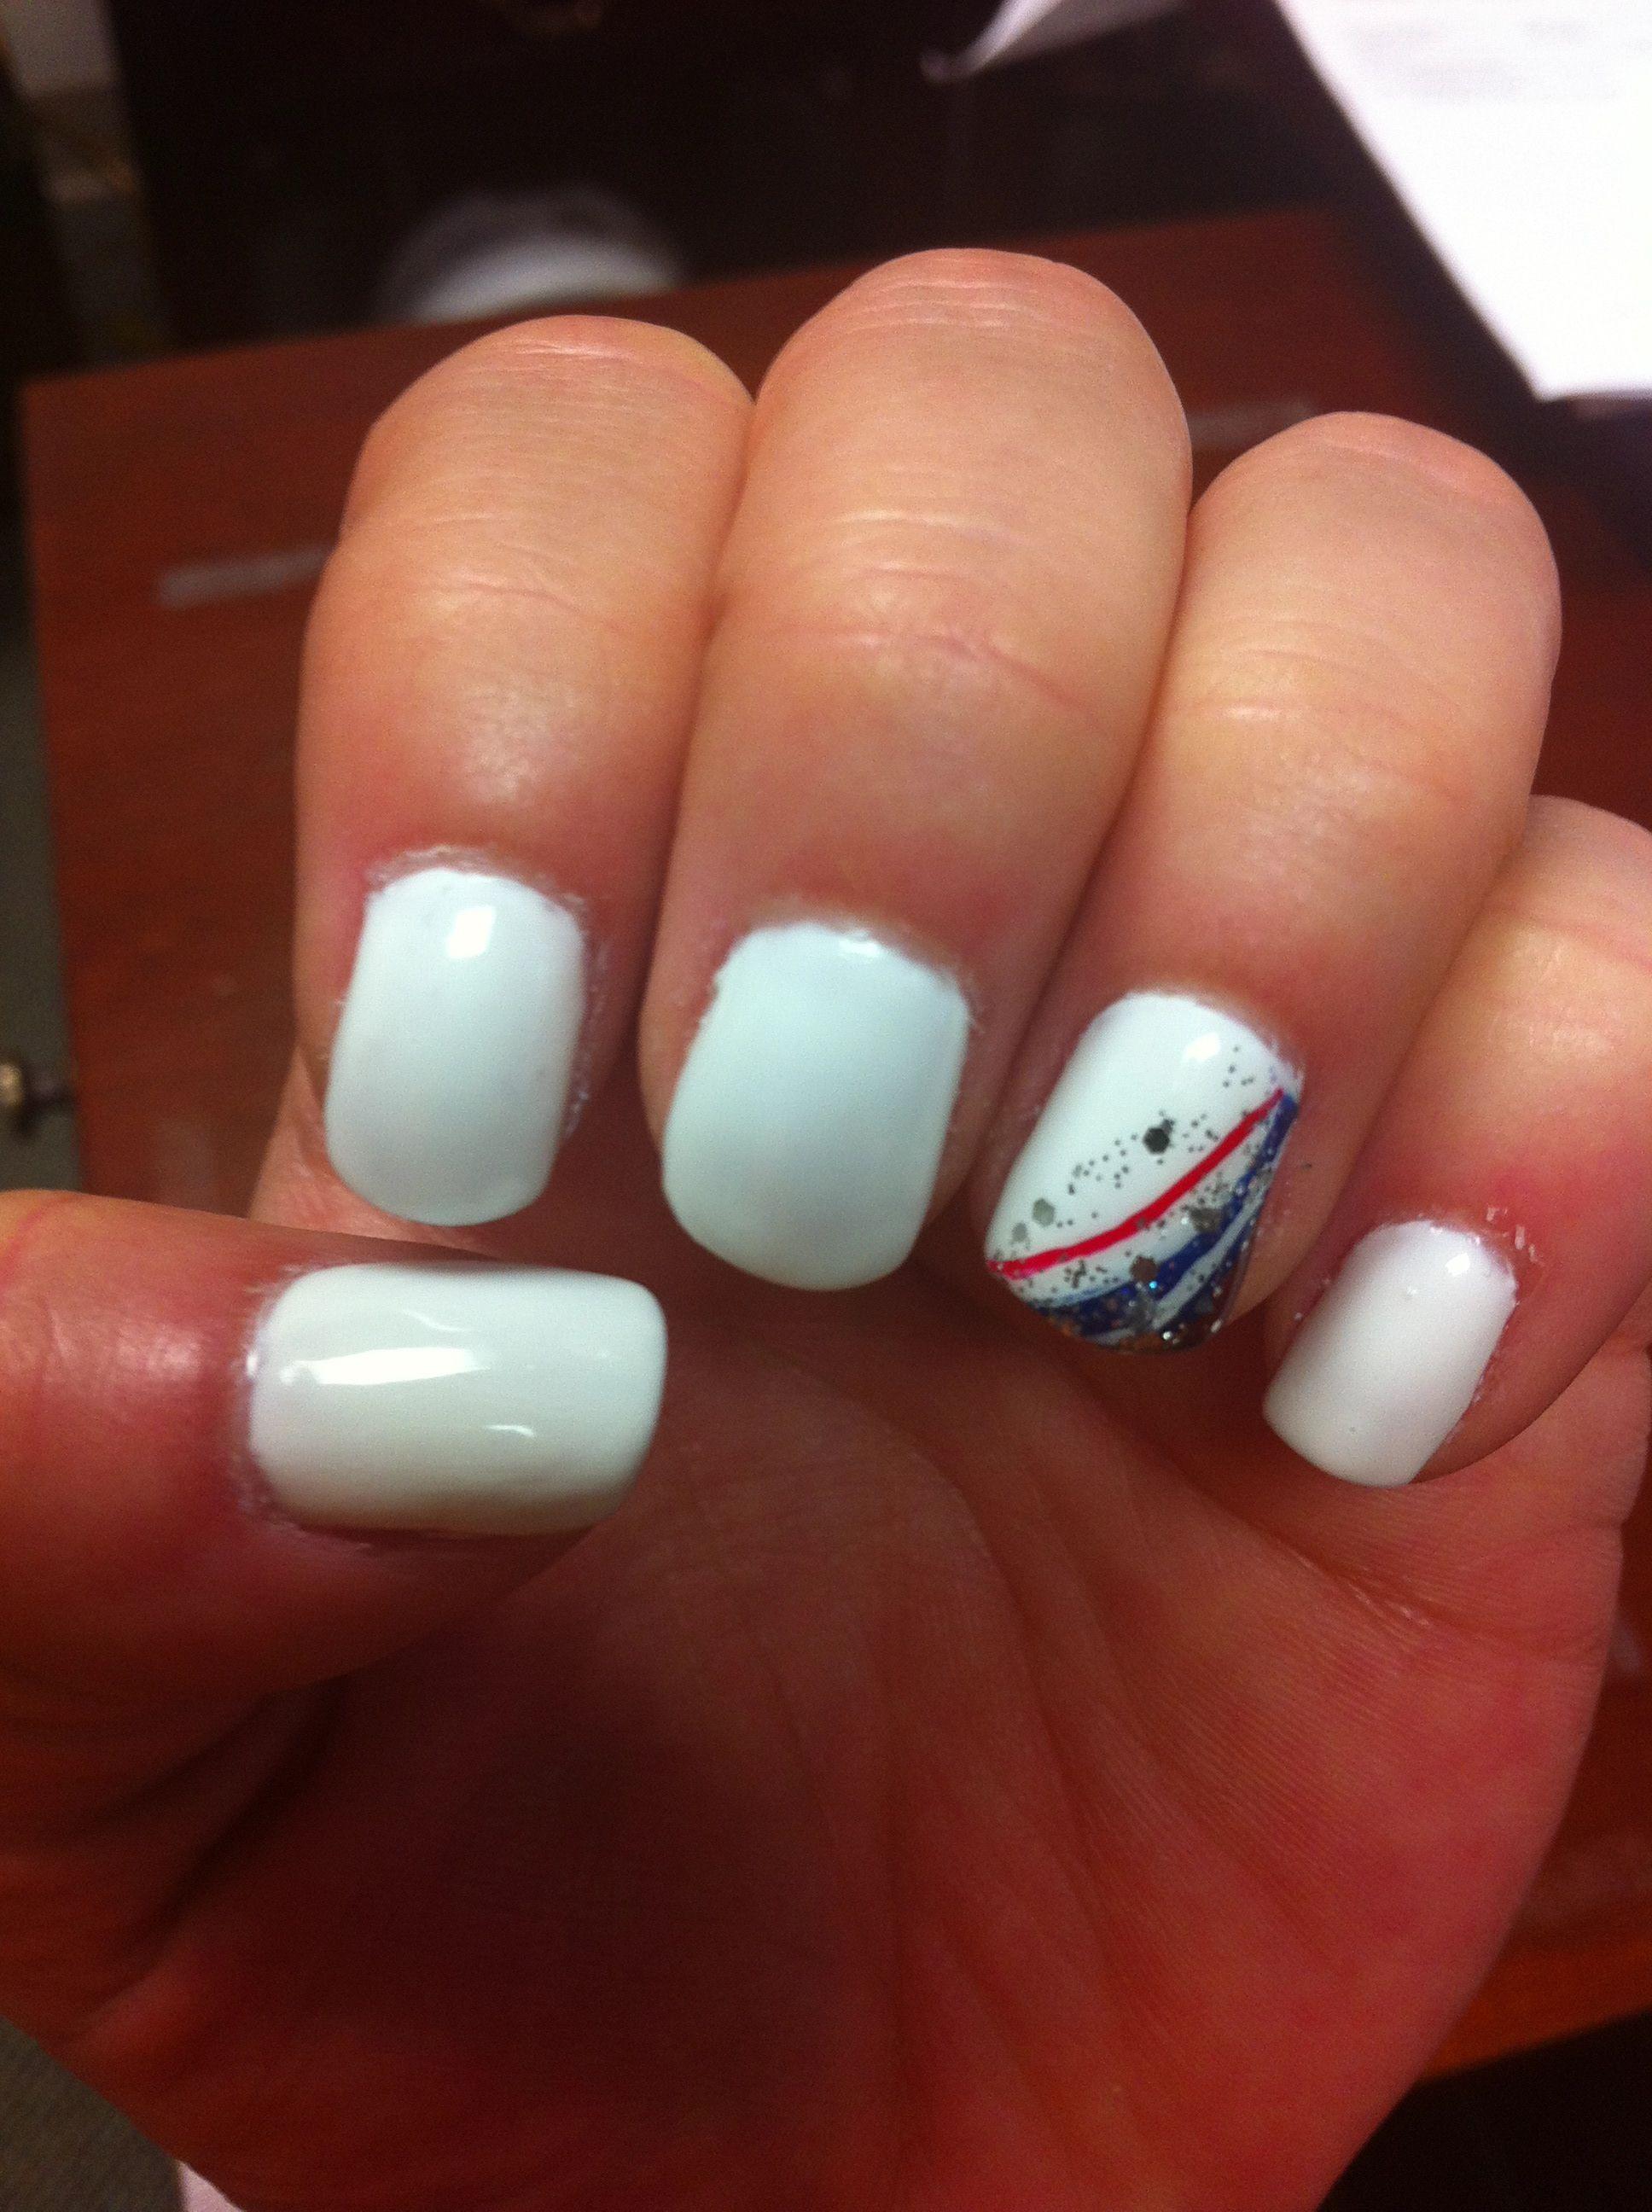 Pin by Melissa on Nails | Gel nail art designs, Pink